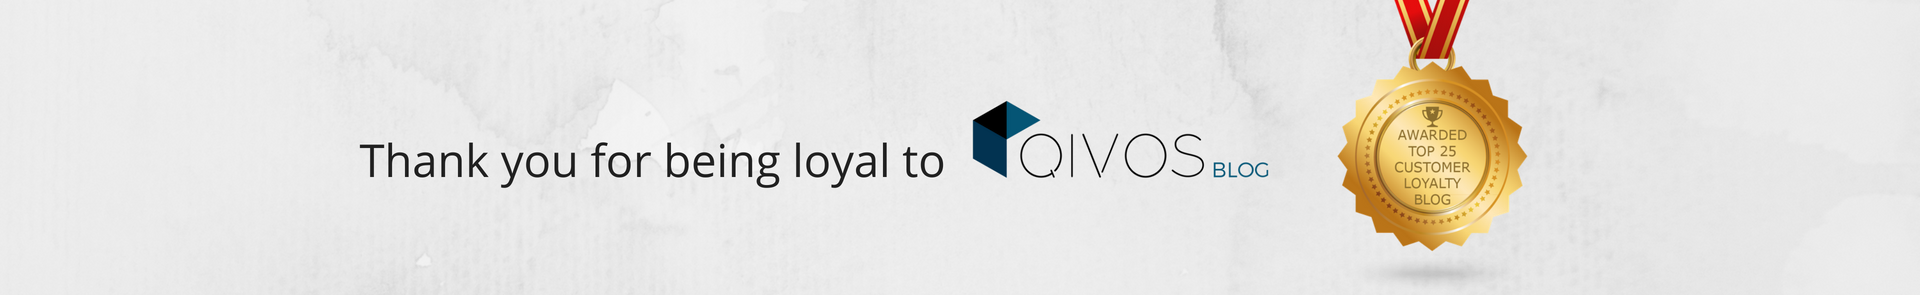 QIVOS loyalty blog